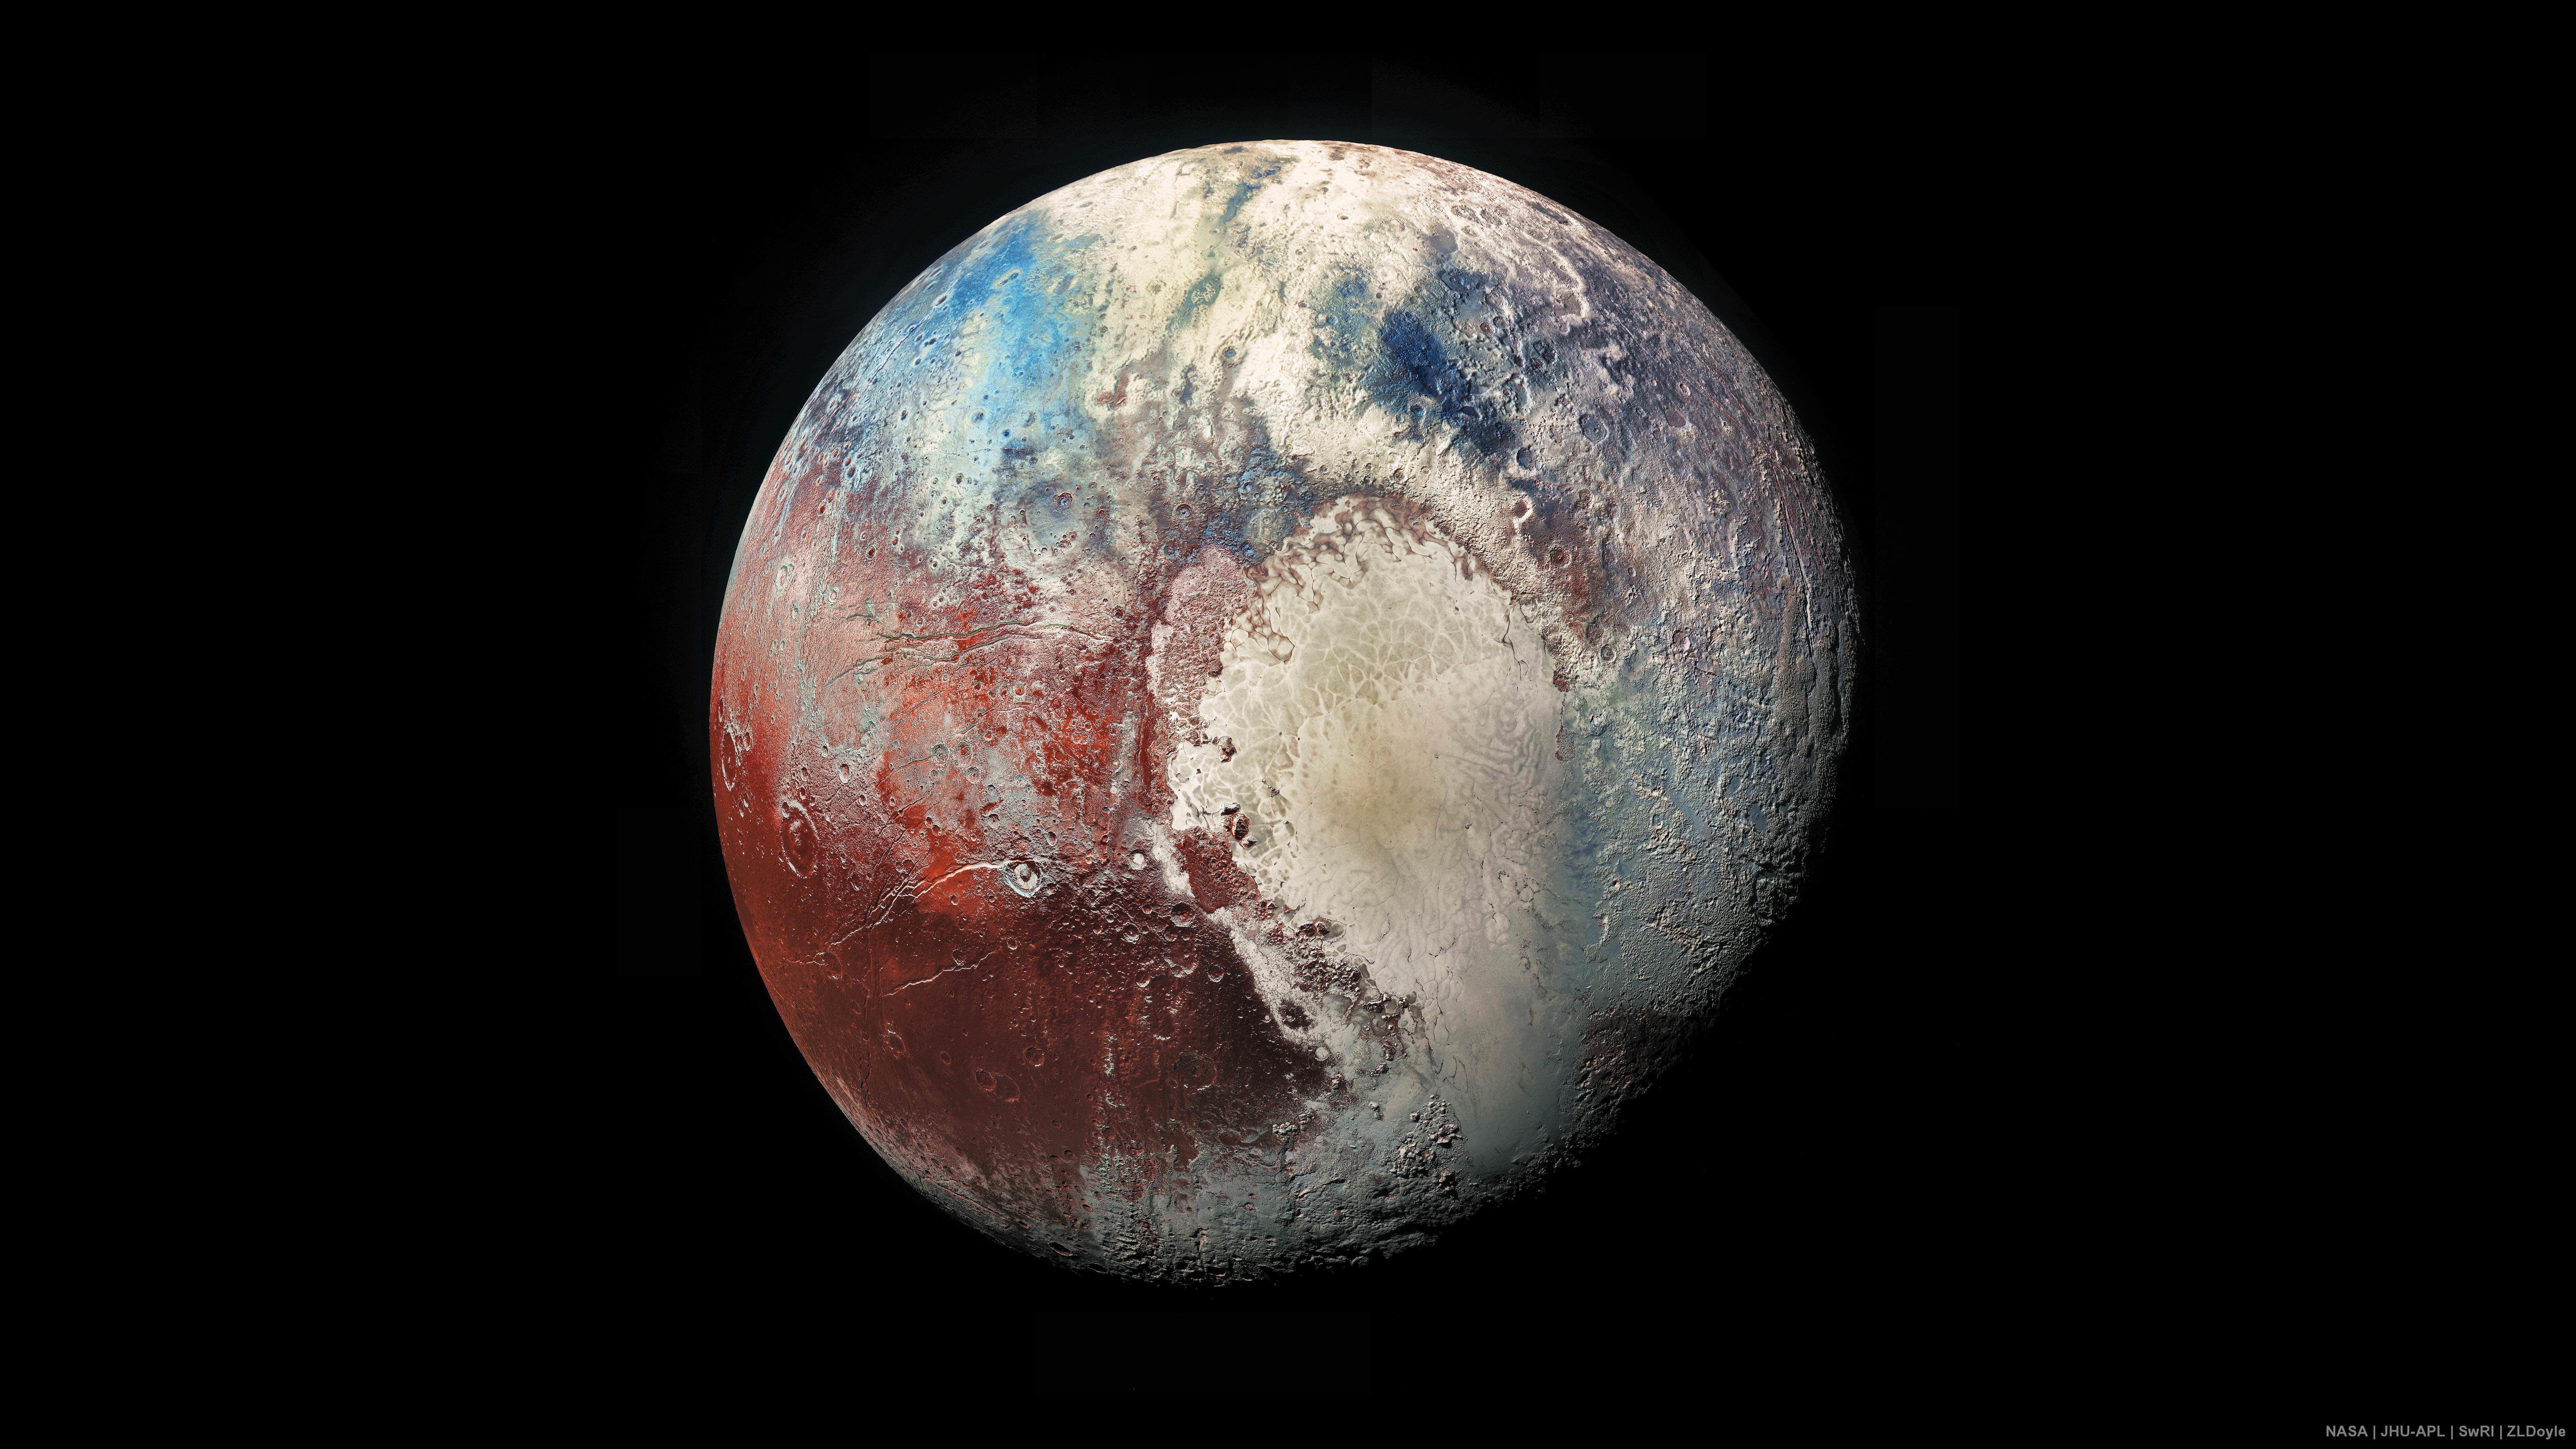 8k Nasa Pluto 4k 8k Wallpaper Hdwallpaper Desktop Pluto Pluto Planet Pluto Images